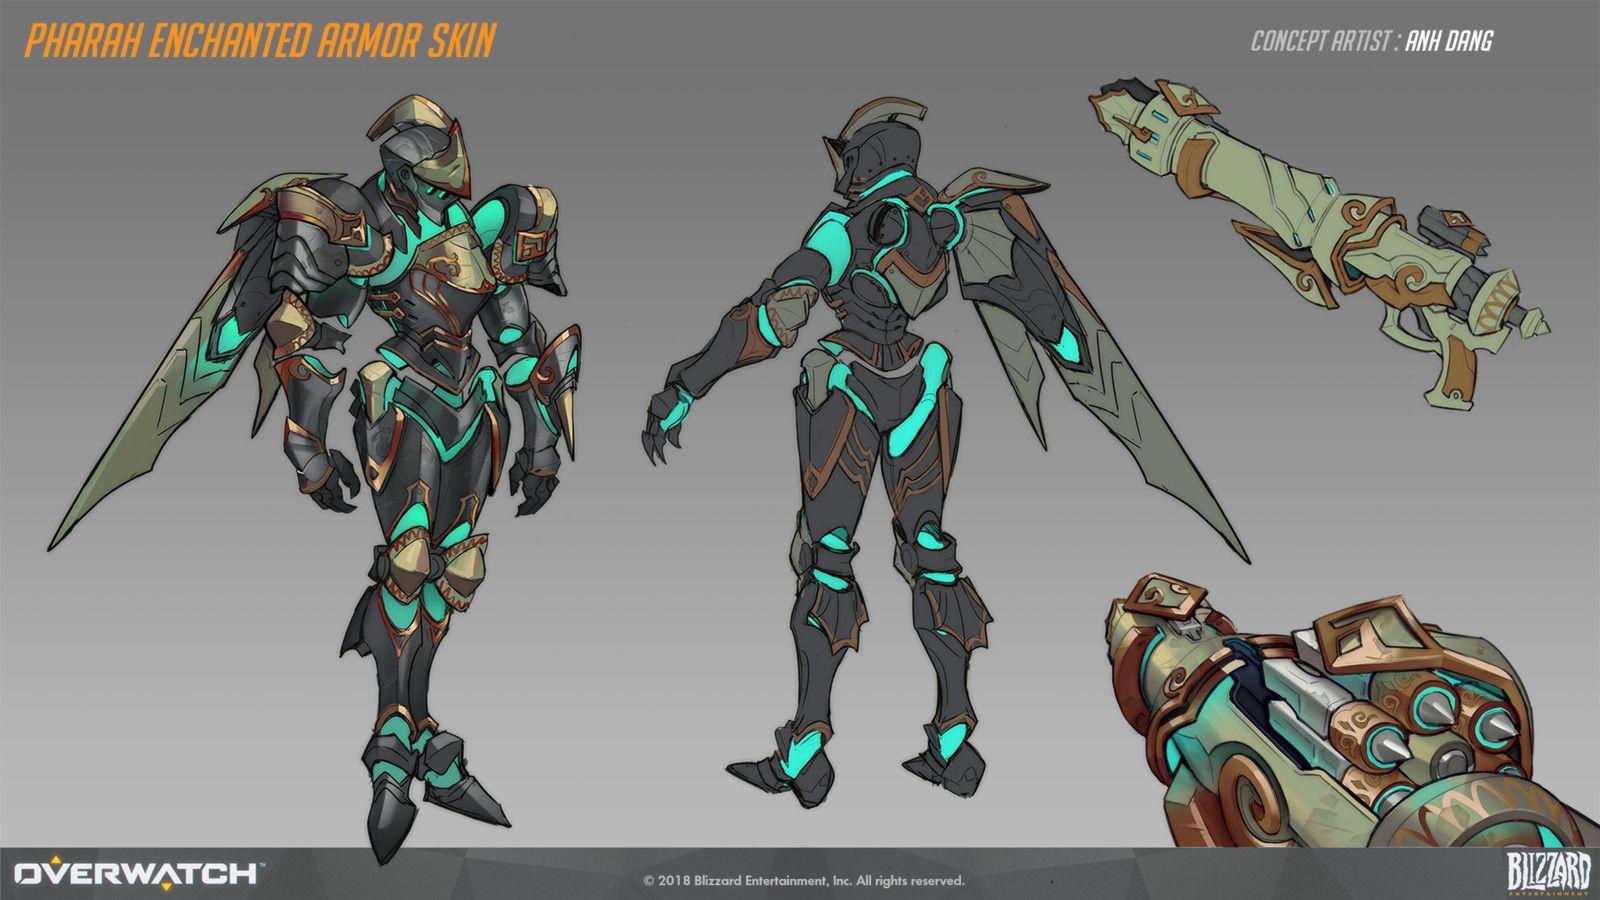 Overwatch Halloween 2020 Pharah Knight Skin Pharah Enchanted Armor Skin Concept, Anh Dang on ArtStation at